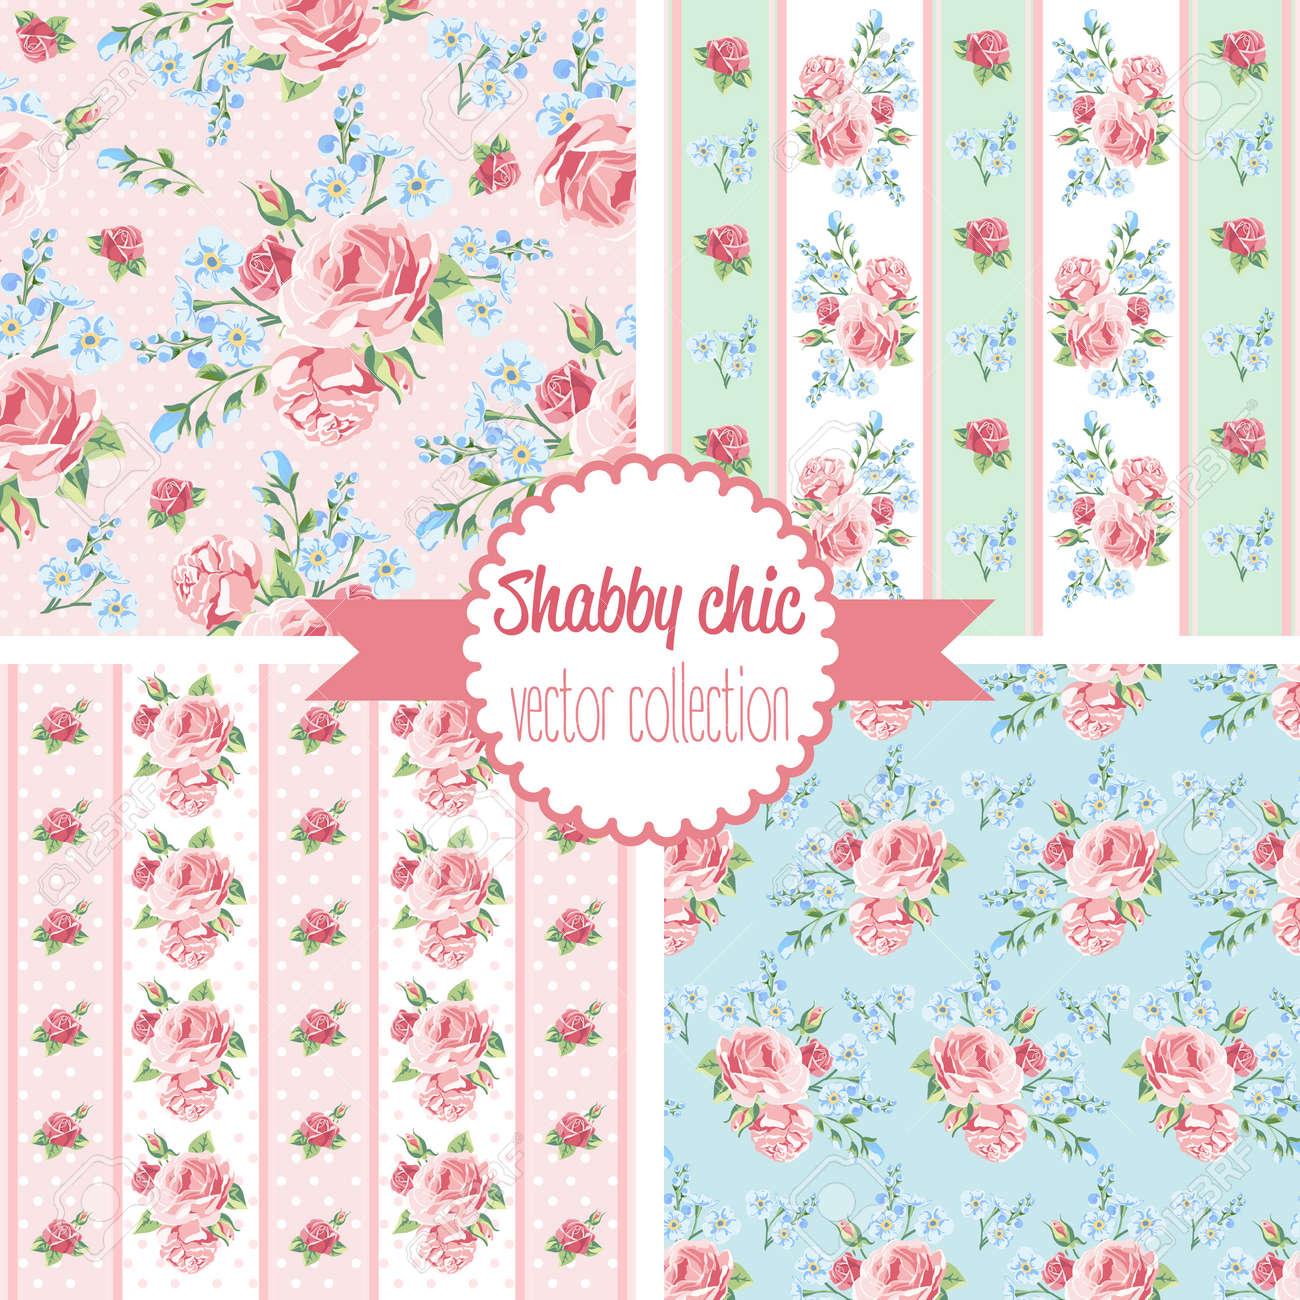 Shabby Chic Rose Patterns Set Seamless Pattern Vintage Floral